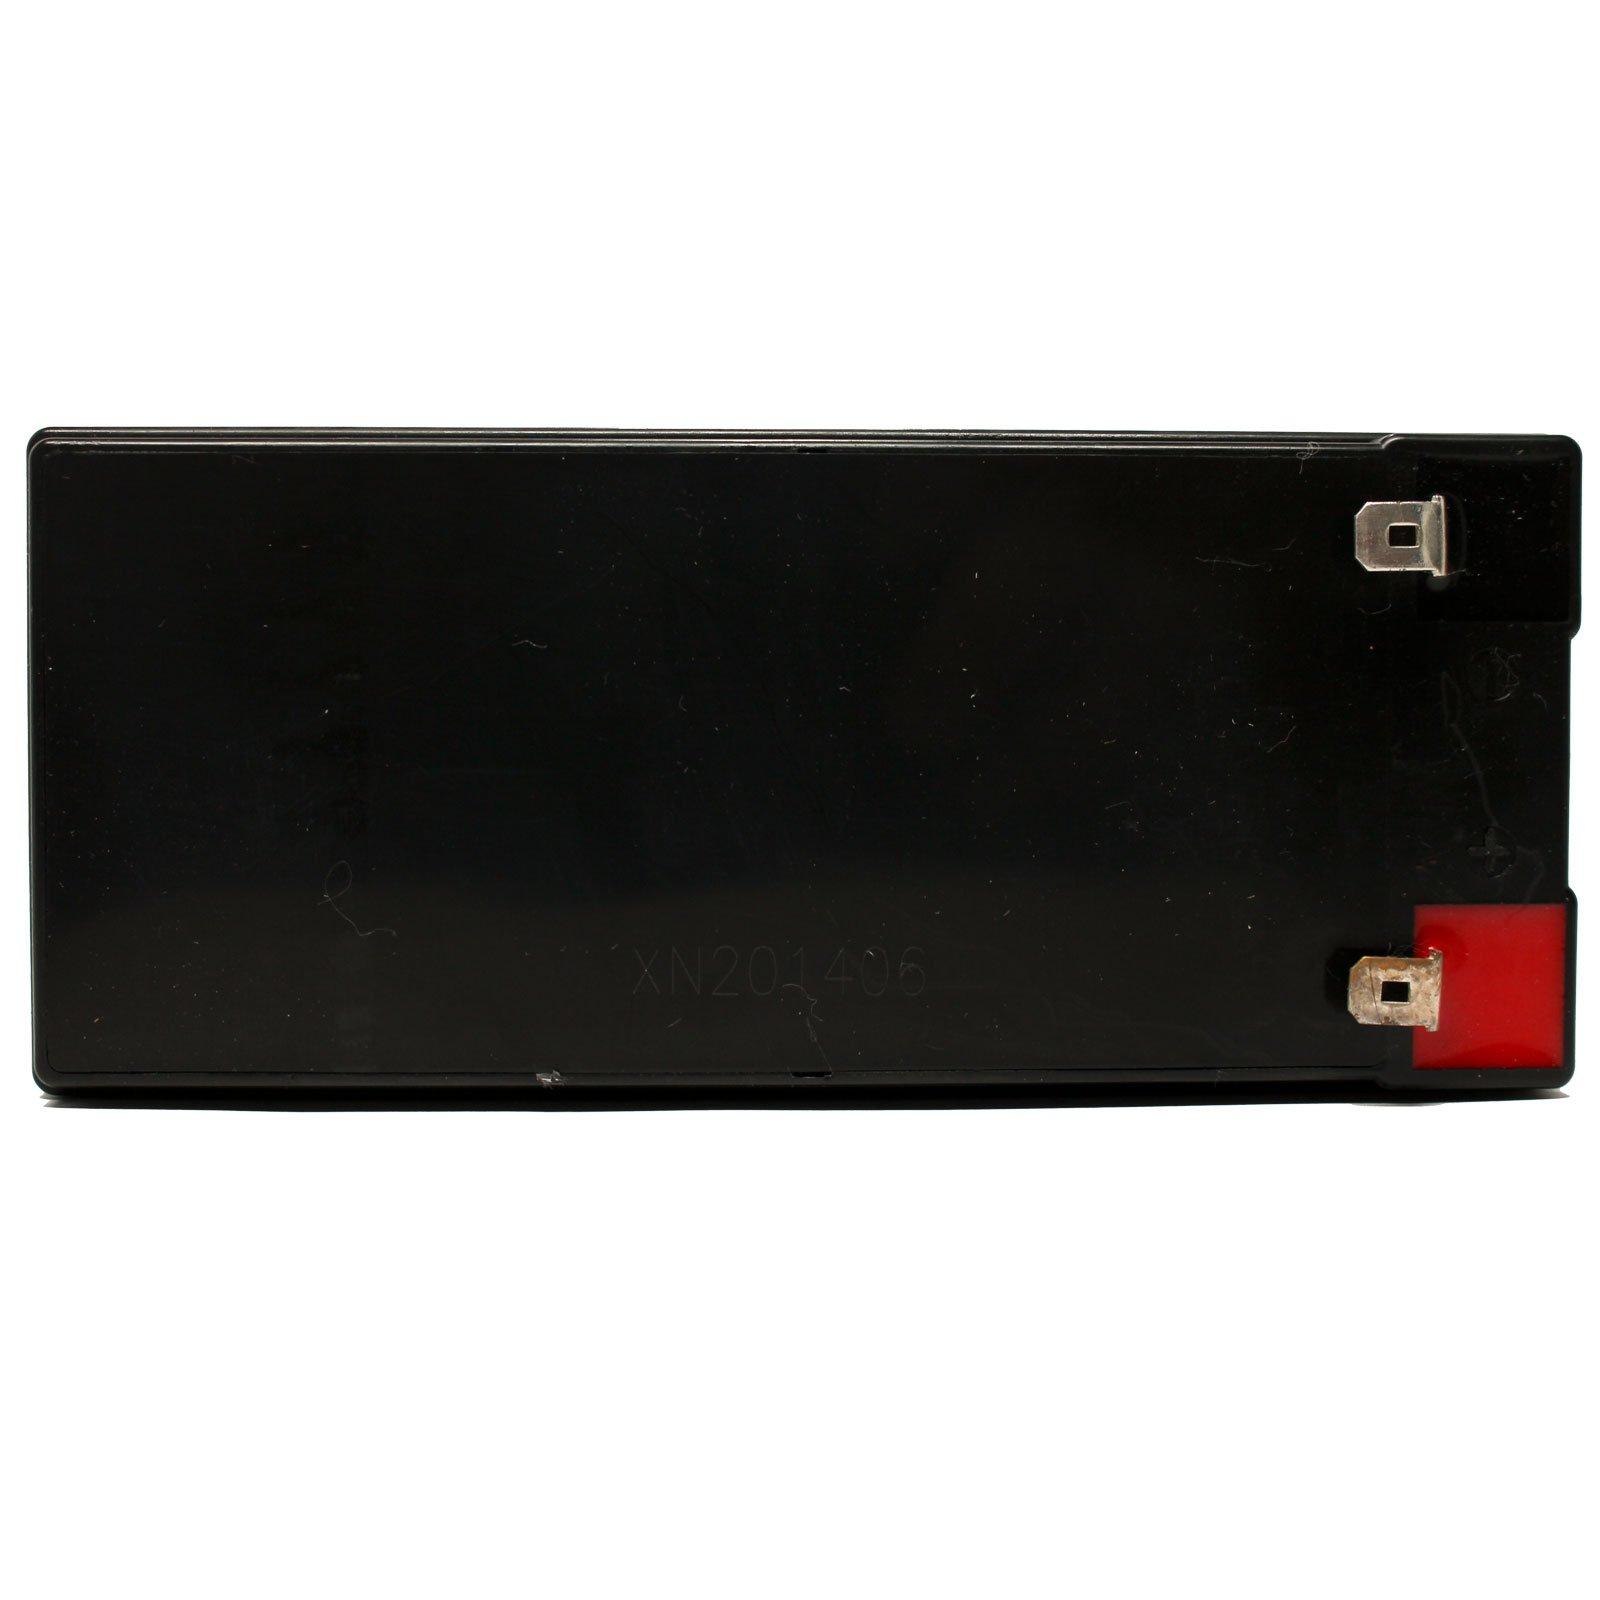 4x Pack - APC SMART-UPS 1500VA USB & SER SUA1500RMUS Battery - Replacement UB1270 Universal Sealed Lead Acid Battery (12V, 7Ah, 7000mAh, F1 Terminal, AGM, SLA) - Includes 8 F1 to F2 Terminal Adapters by UpStart Battery (Image #5)